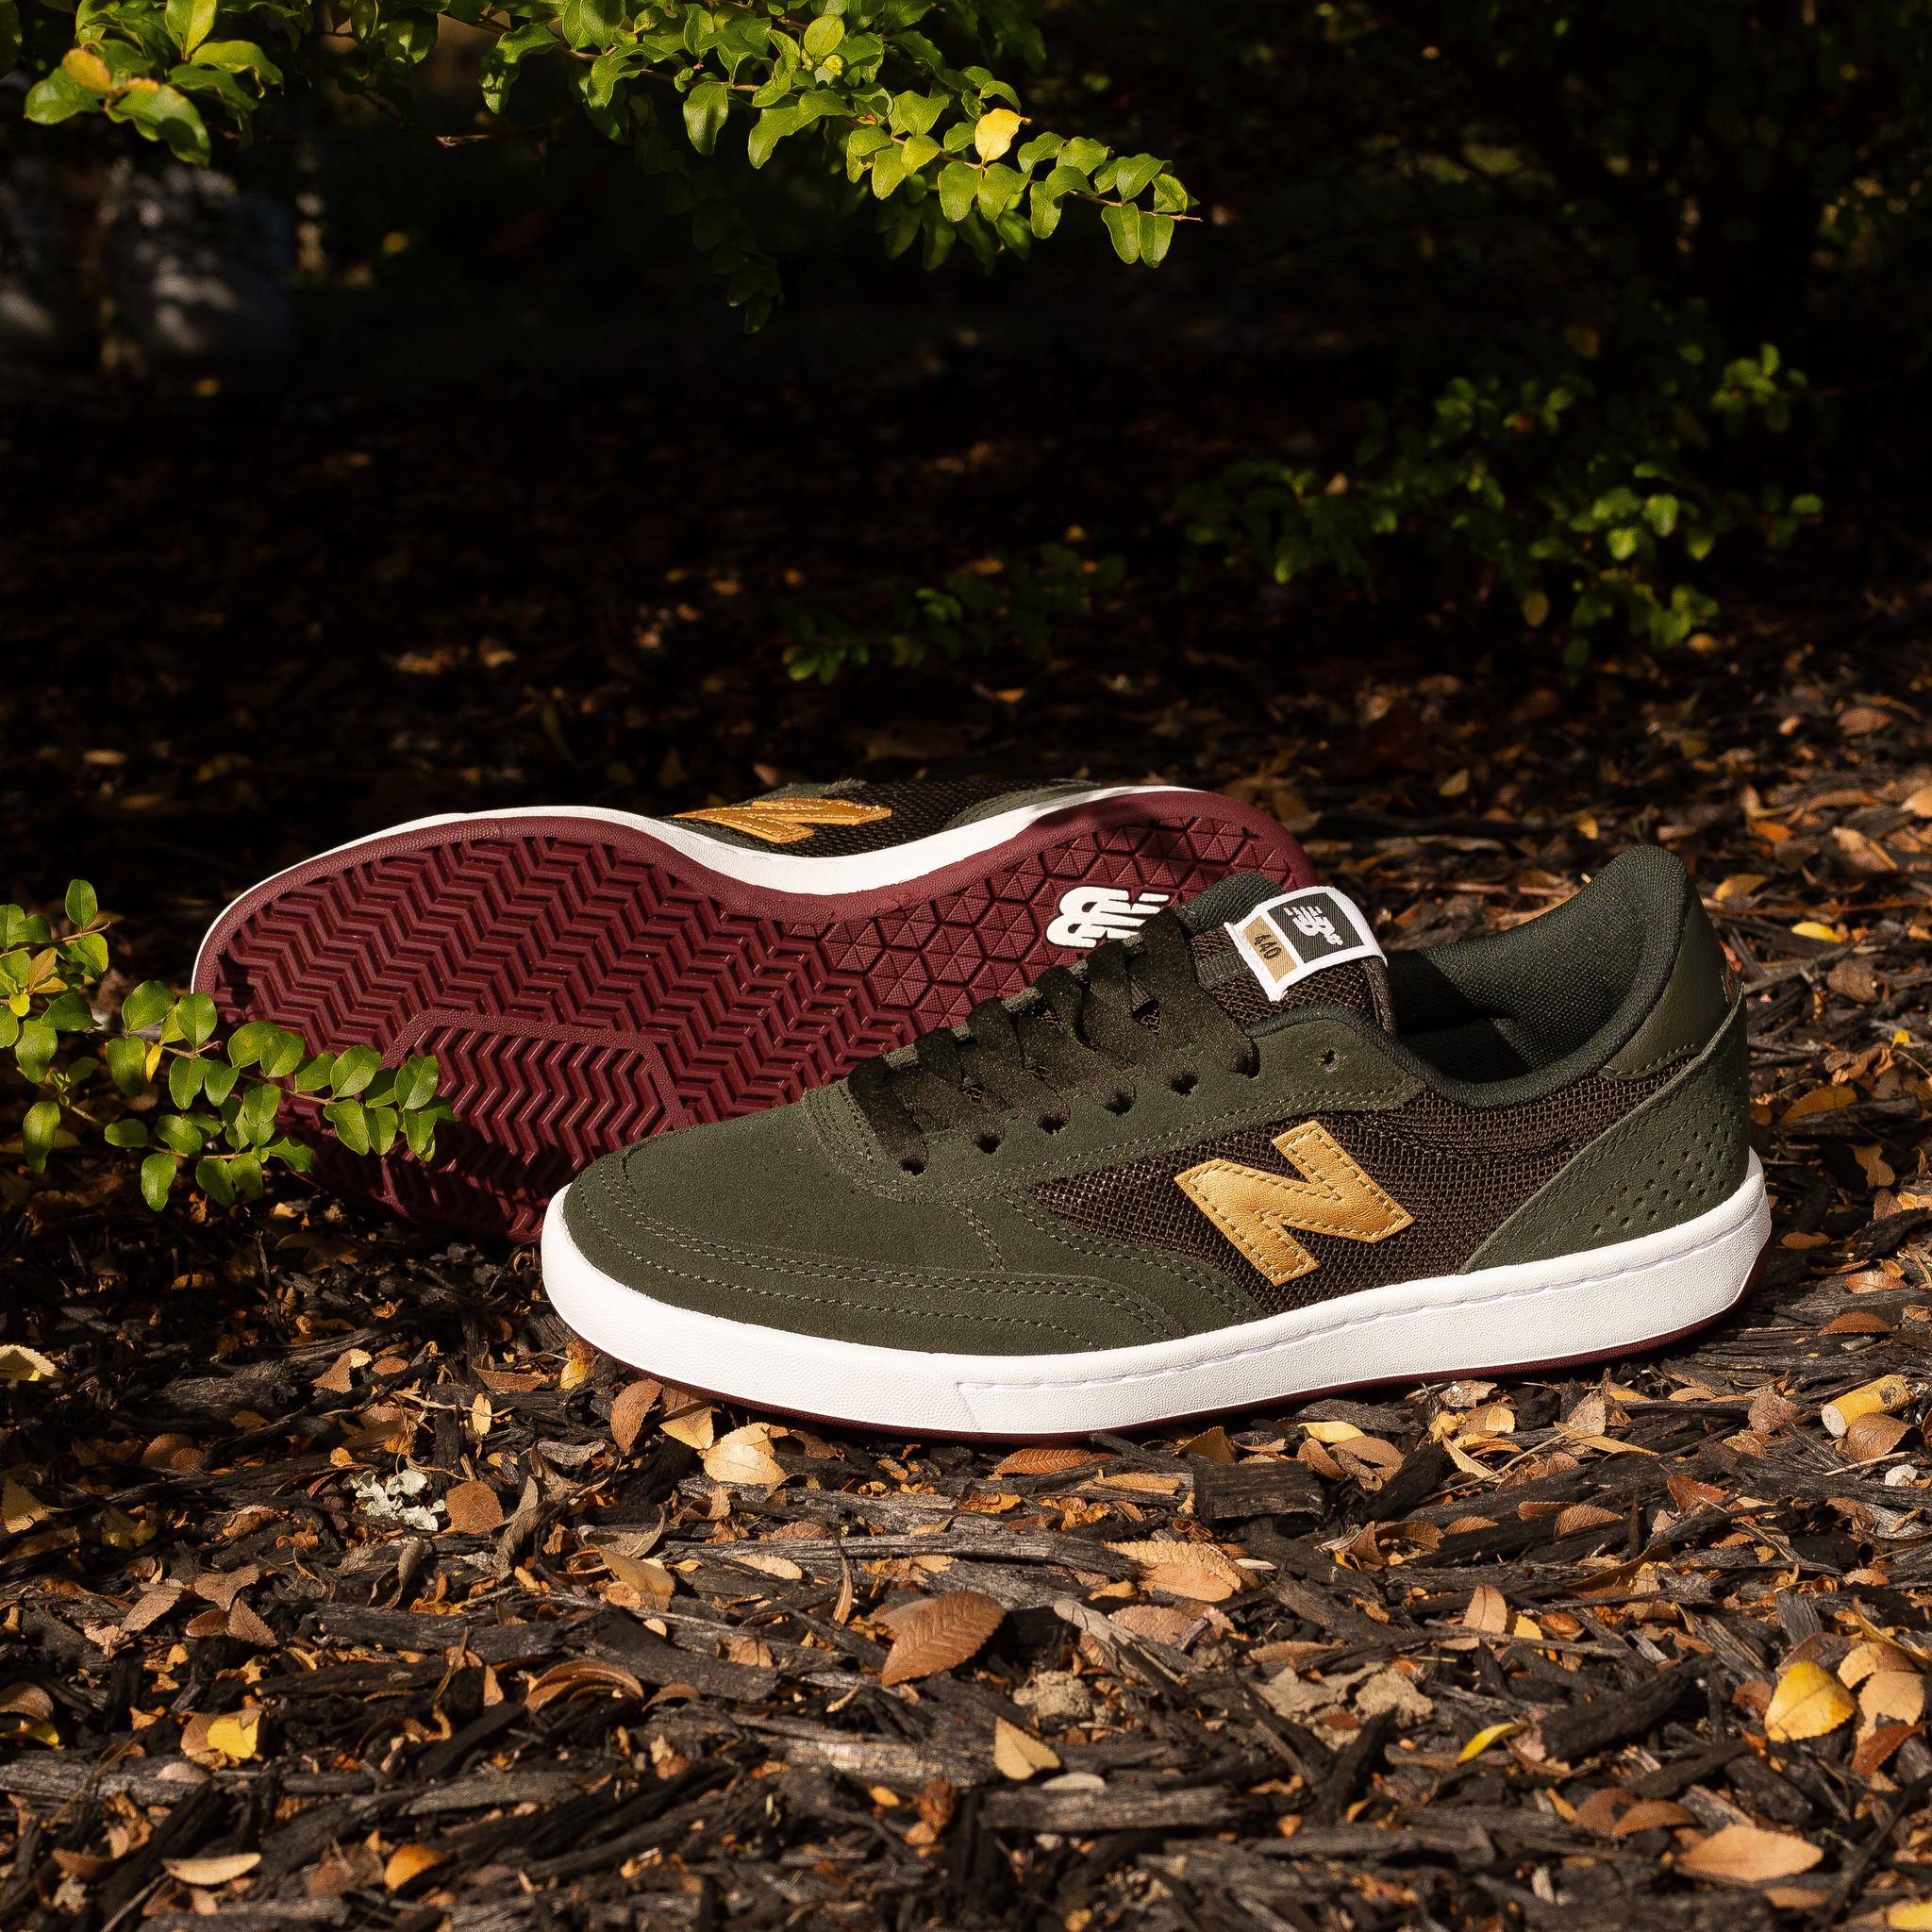 New Balance New Balance 440